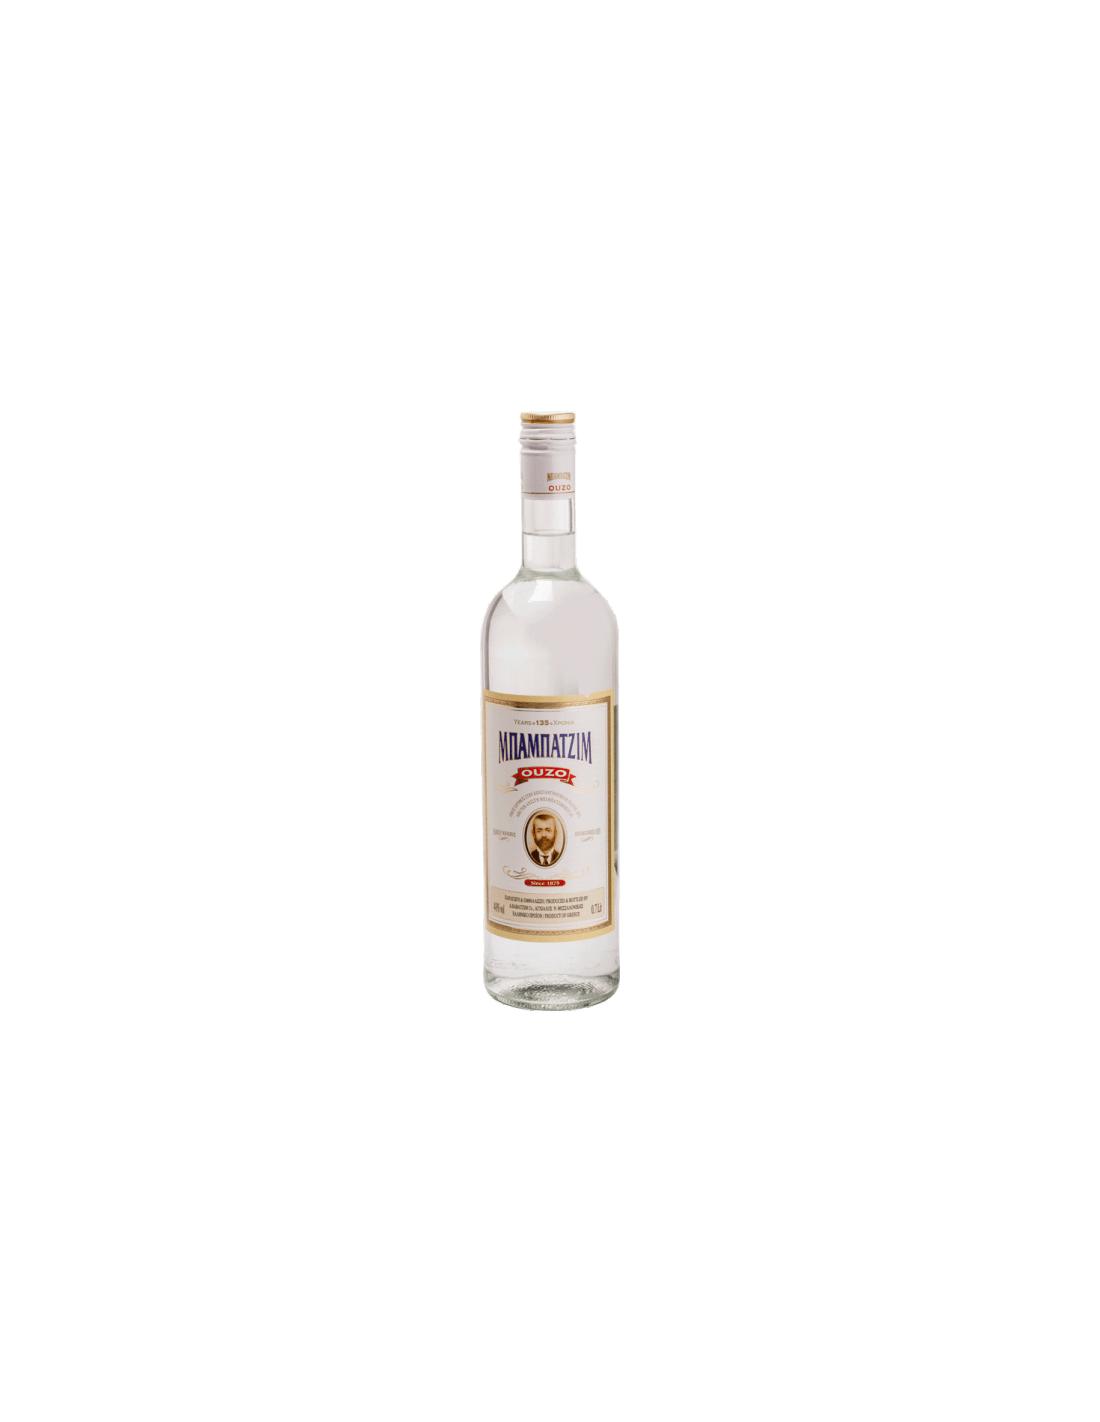 Bautura traditionala Ouzo Babatzim, 40% alc., 0.7L, Grecia